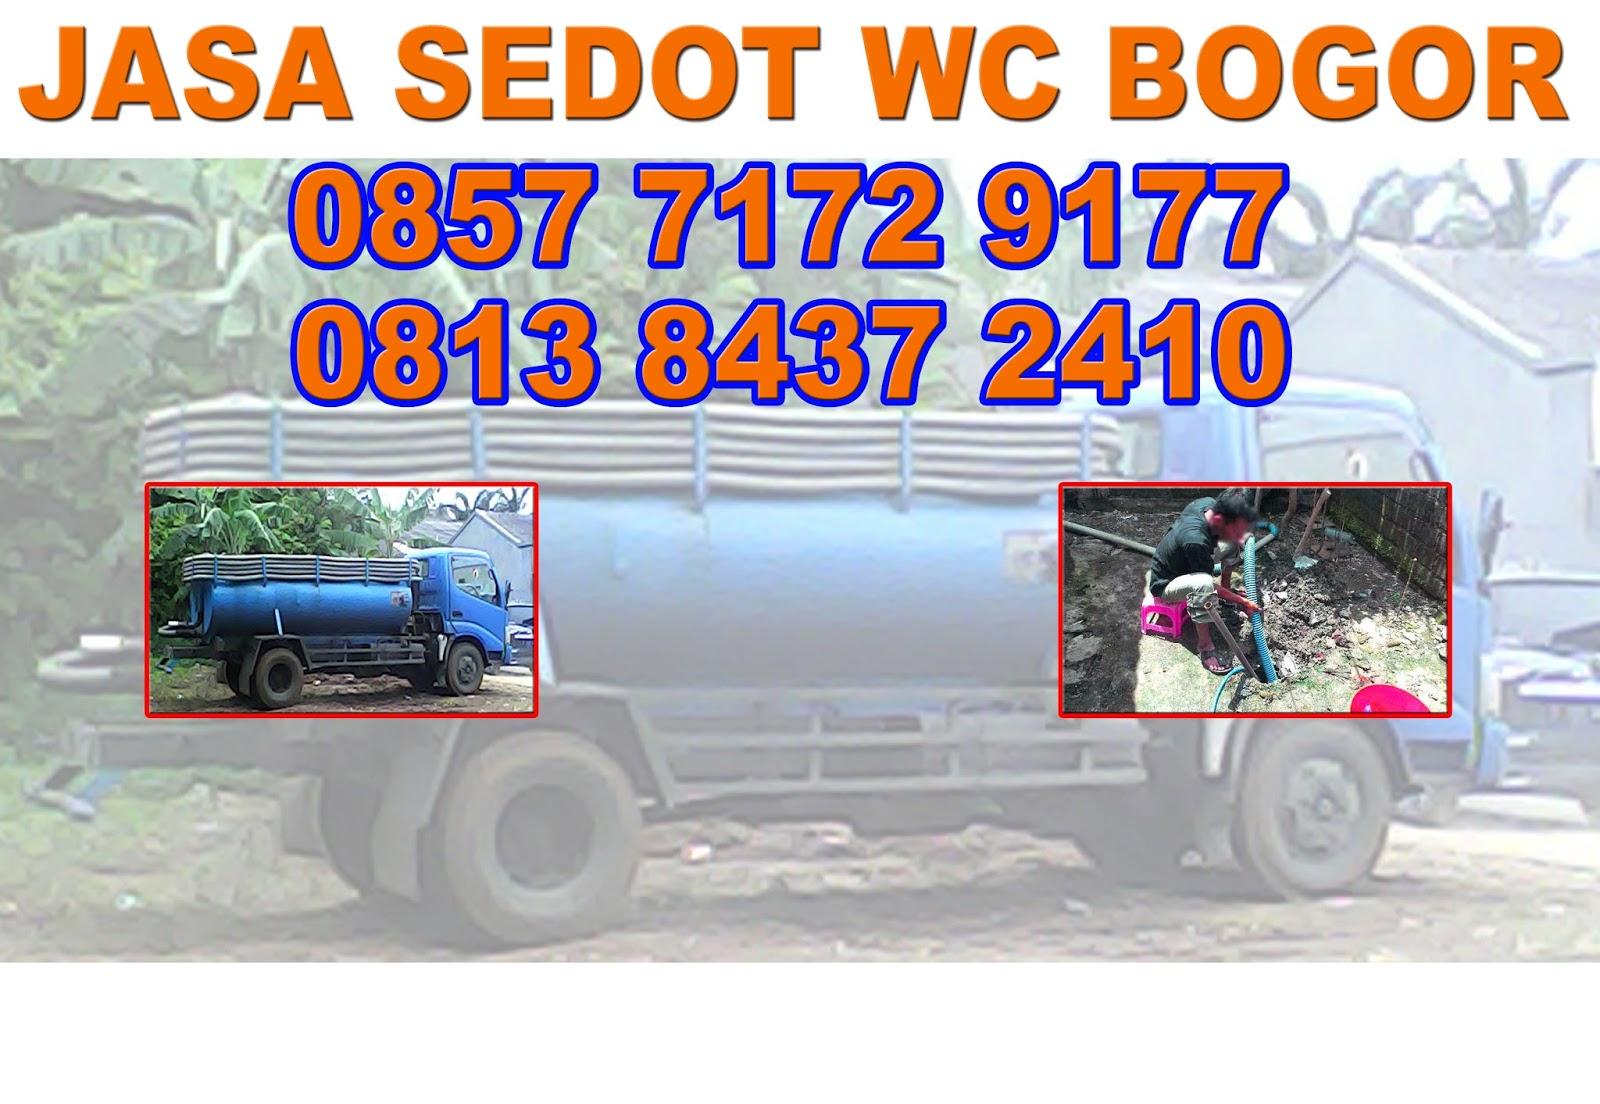 JASA SEDOT WC BOGOR - 081380124012 | PELAYANAN BOGOR